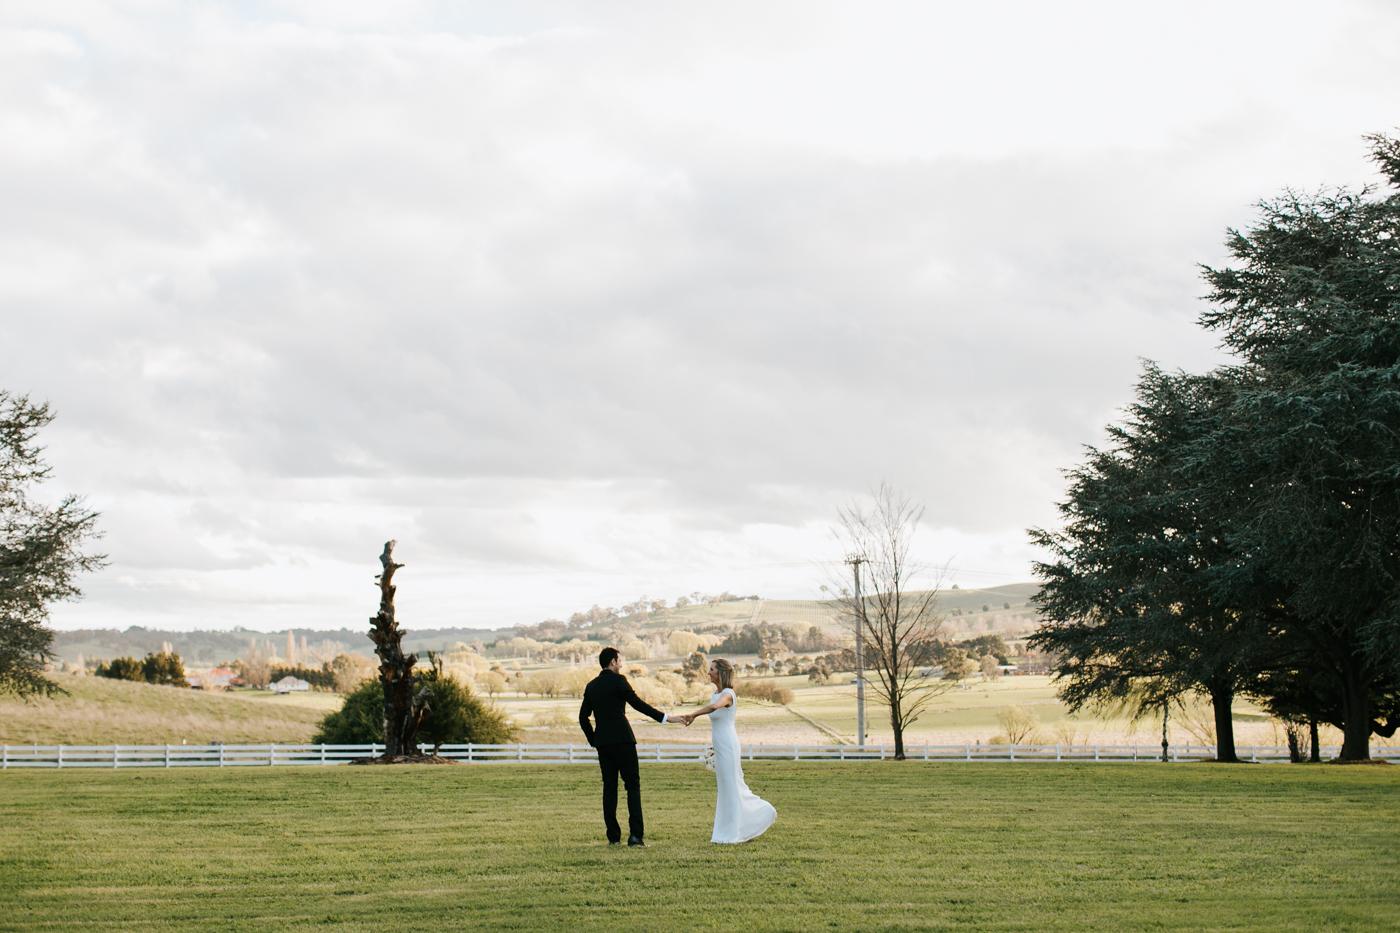 Bridget & James - Orange Country Wedding - Samantha Heather Photography-149.jpg